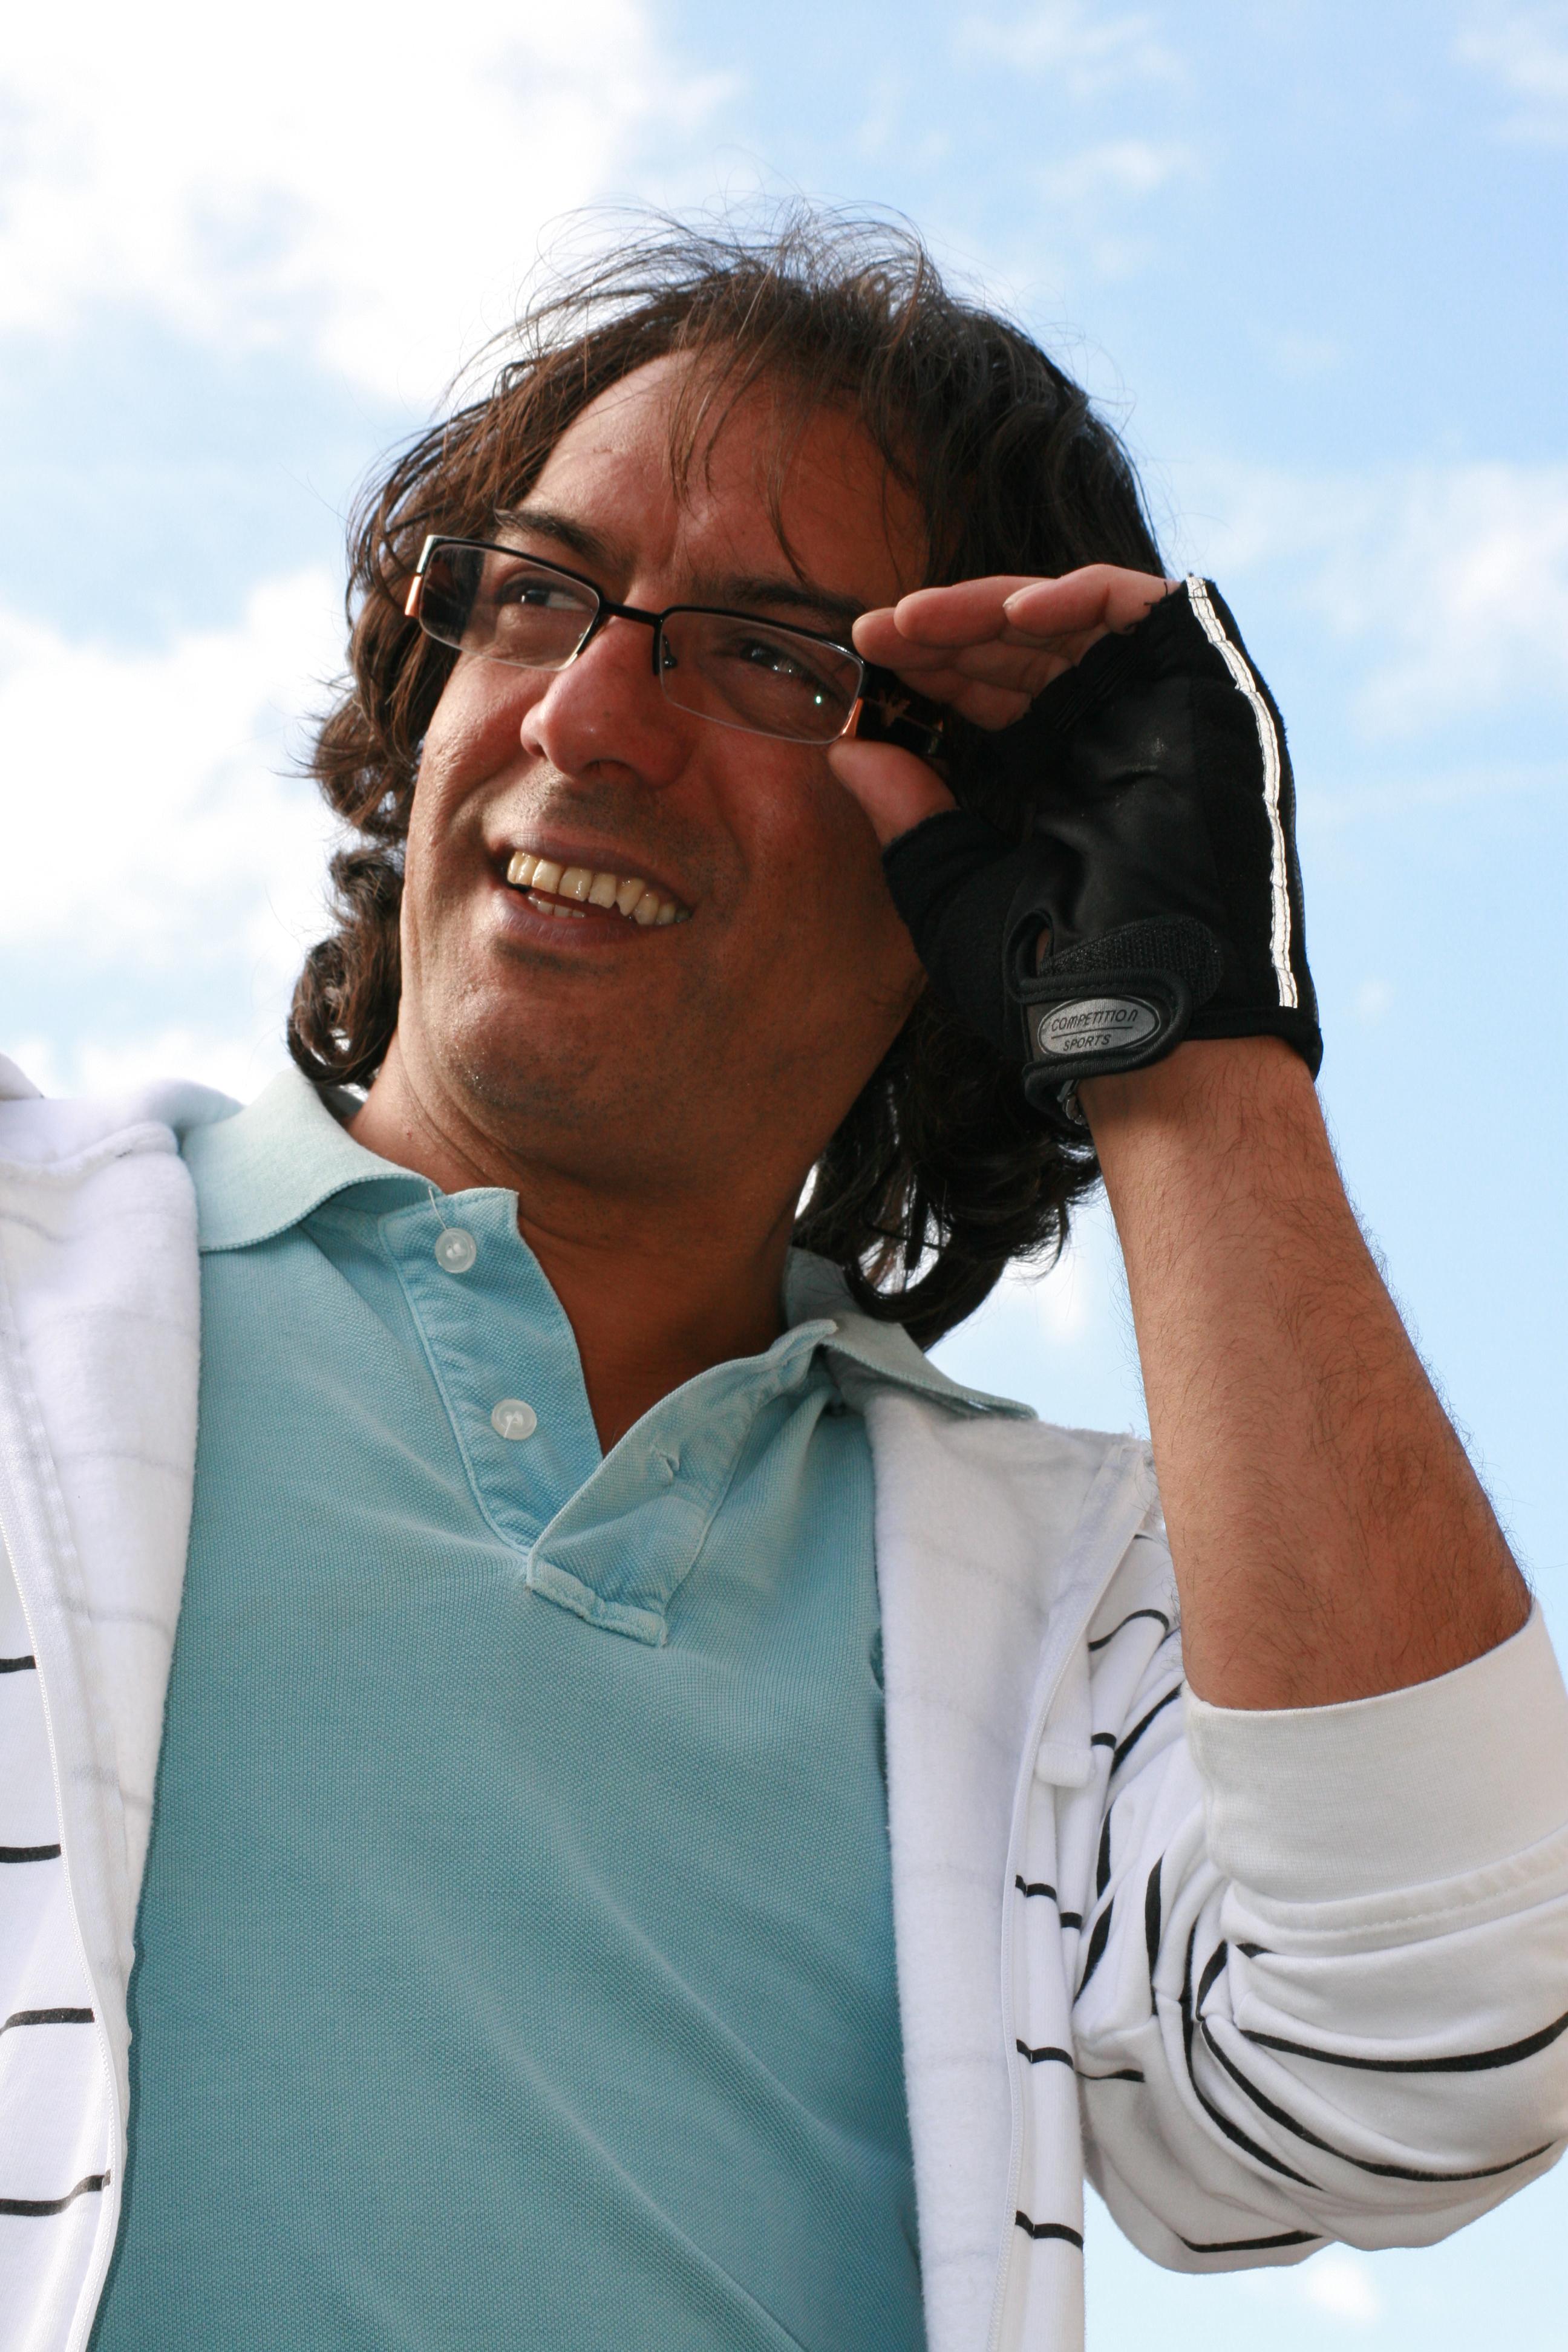 Pedram Rahmany